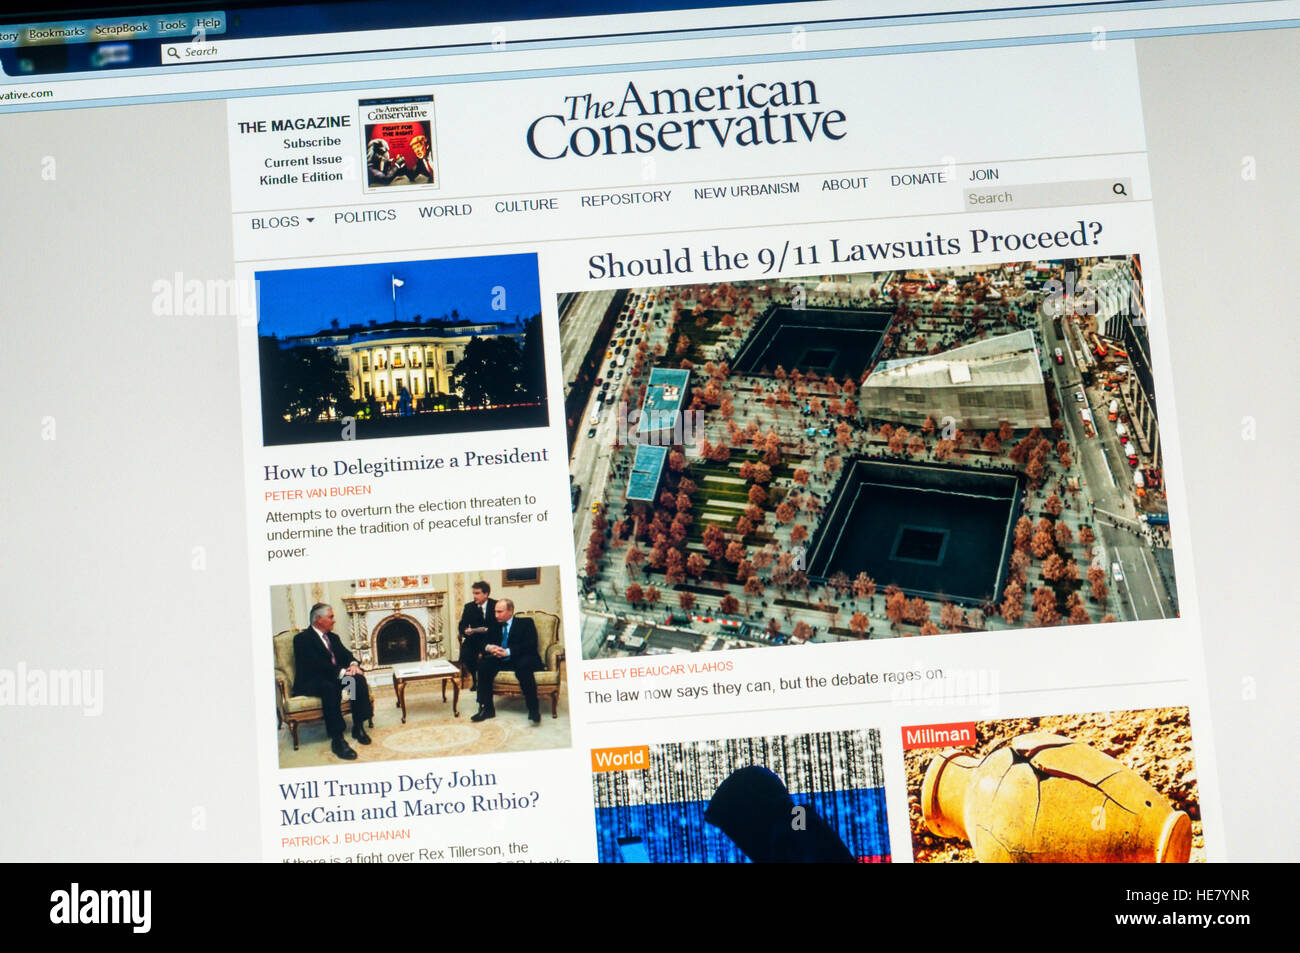 Rechter Flügel amerikanische Website der amerikanische Konservative. Stockbild